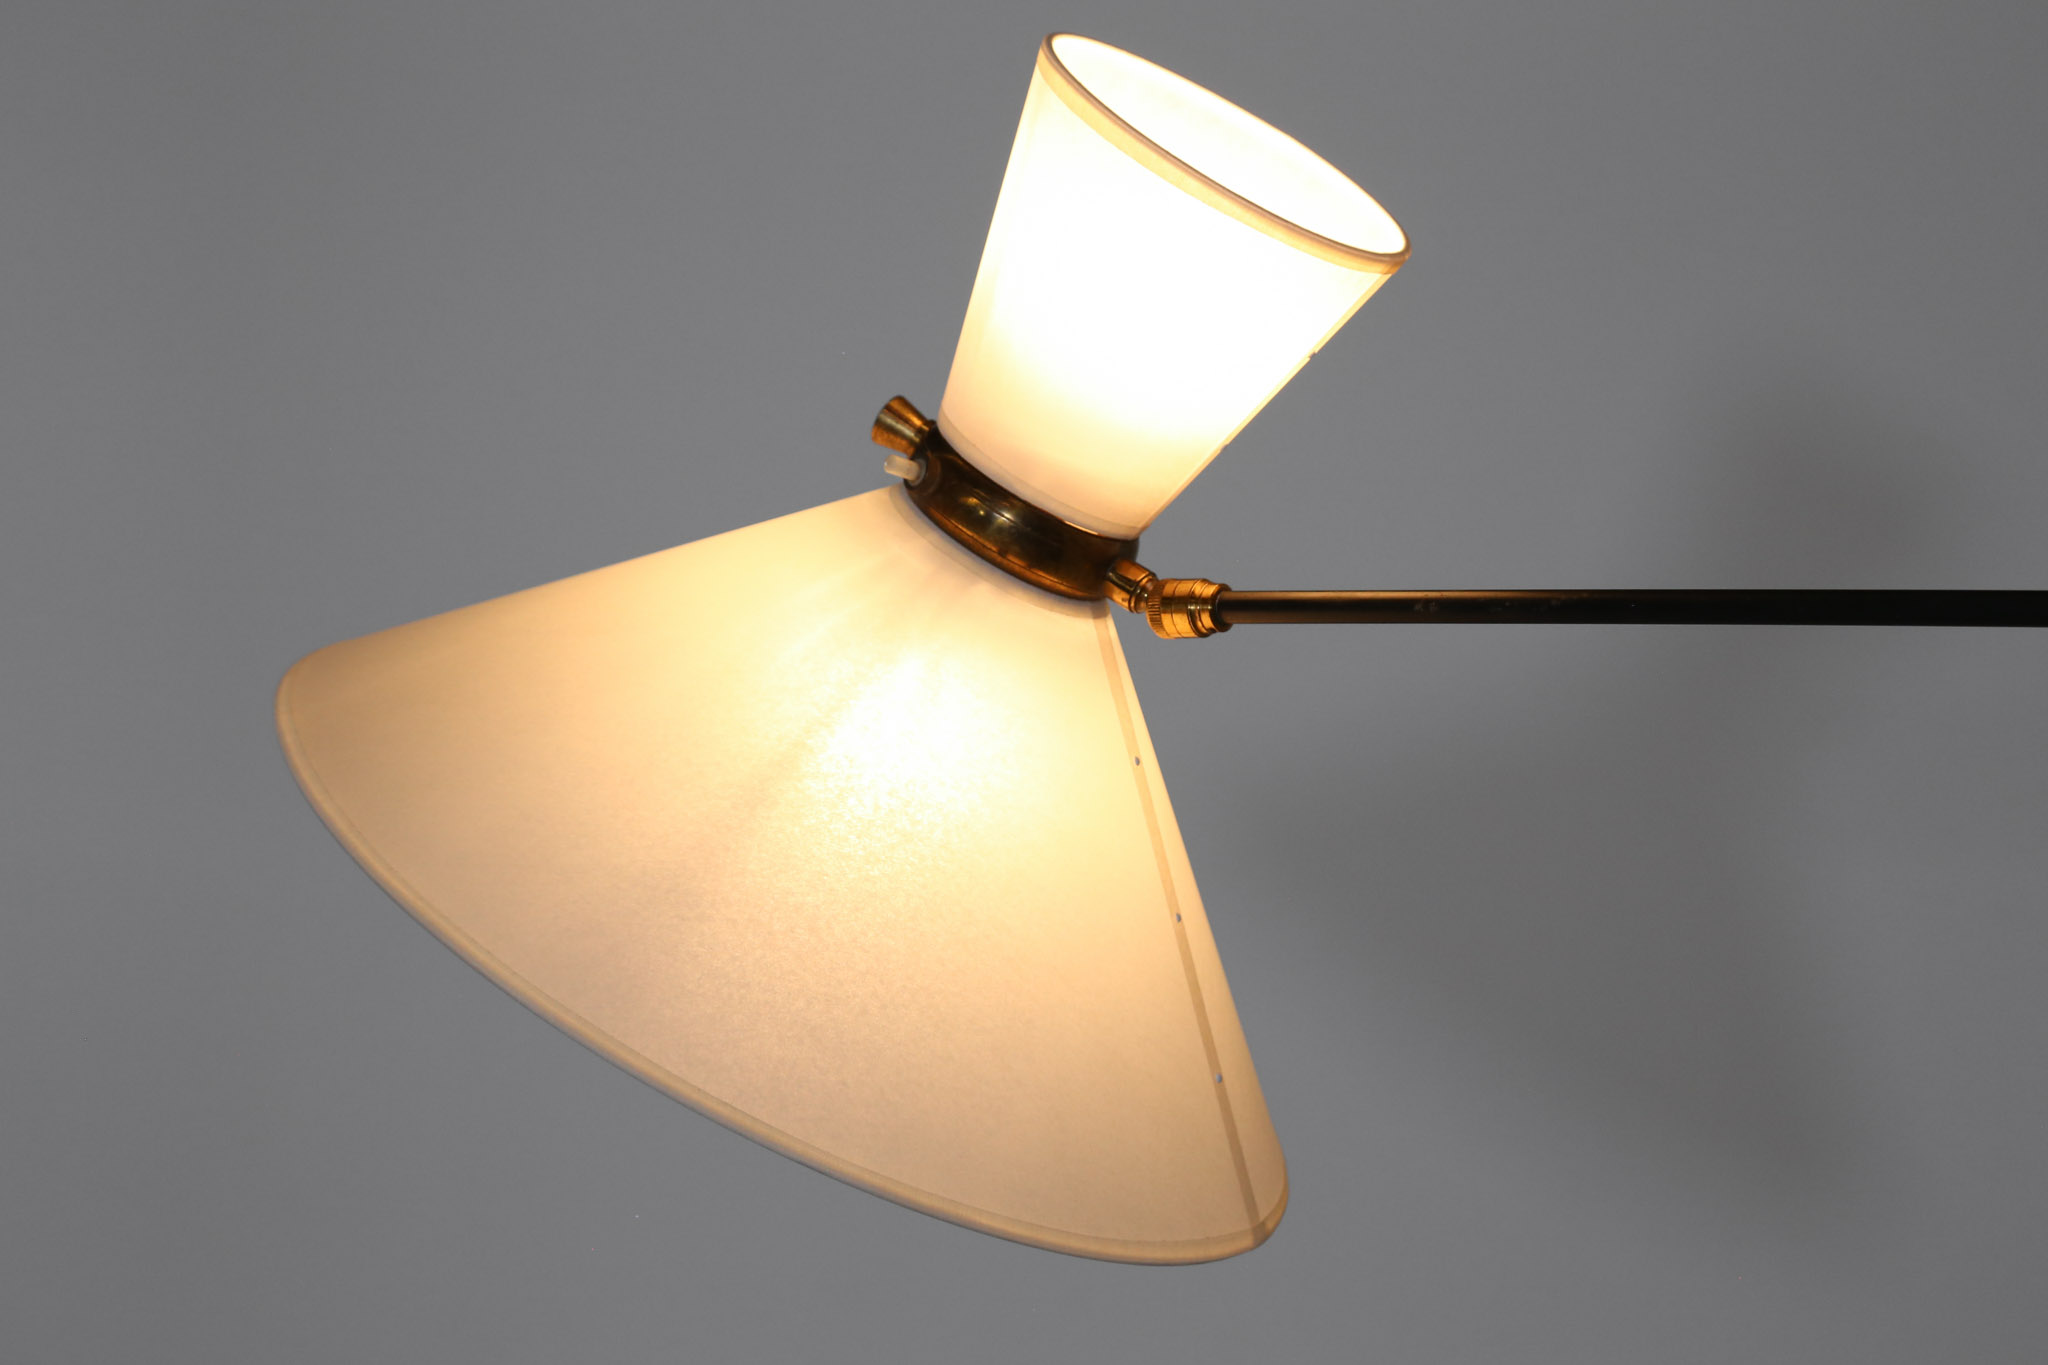 Vintage Wall Light From Lunel Mid Century Lamp 1960s Danke Galerie